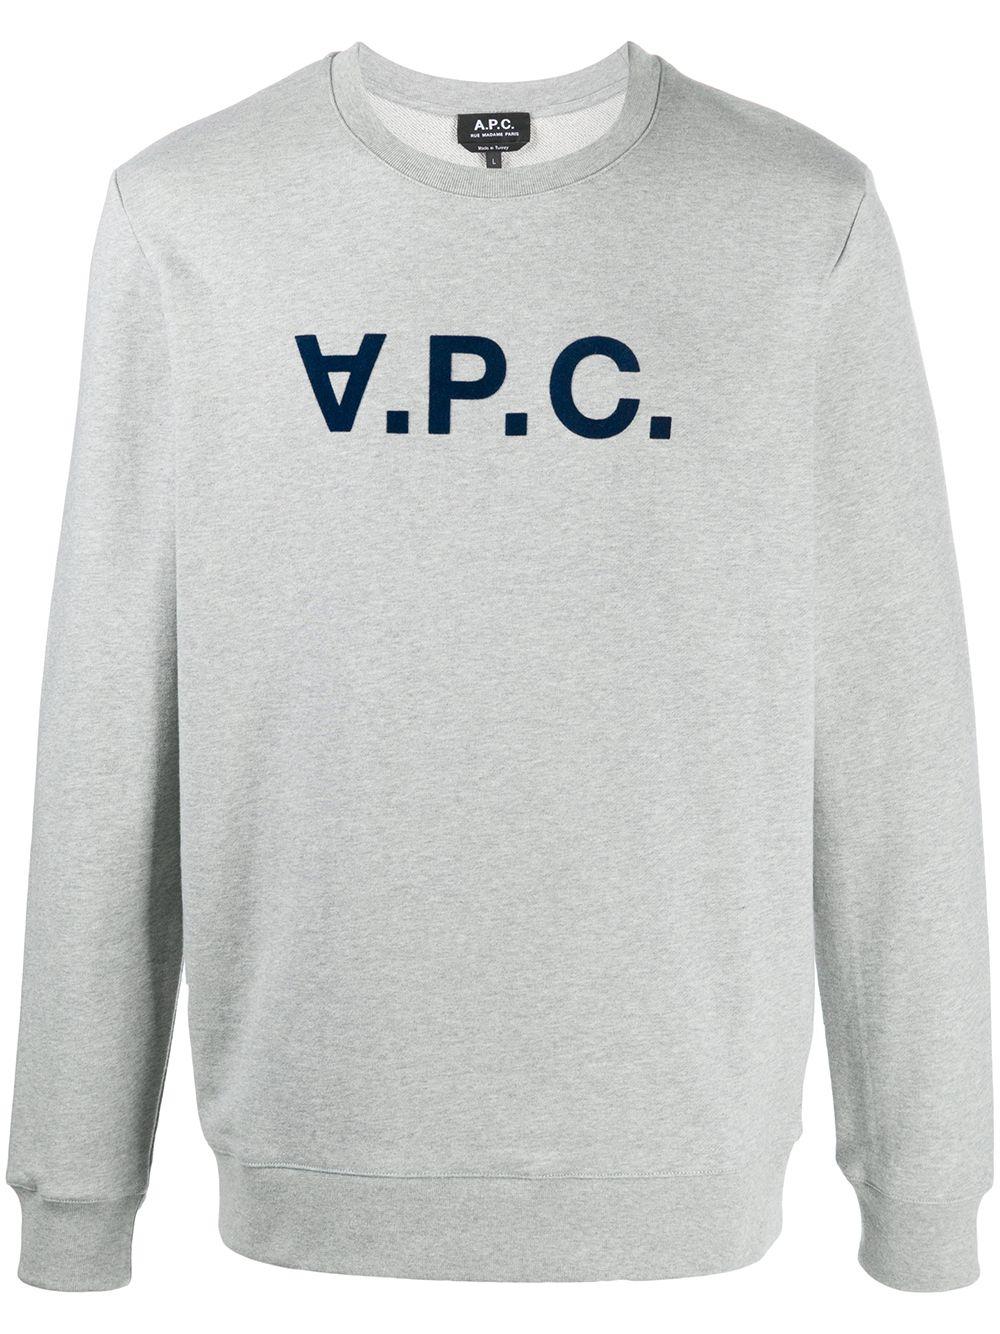 <p class='small-title'>A.P.C.</p>A.P.C. Sweatshirt